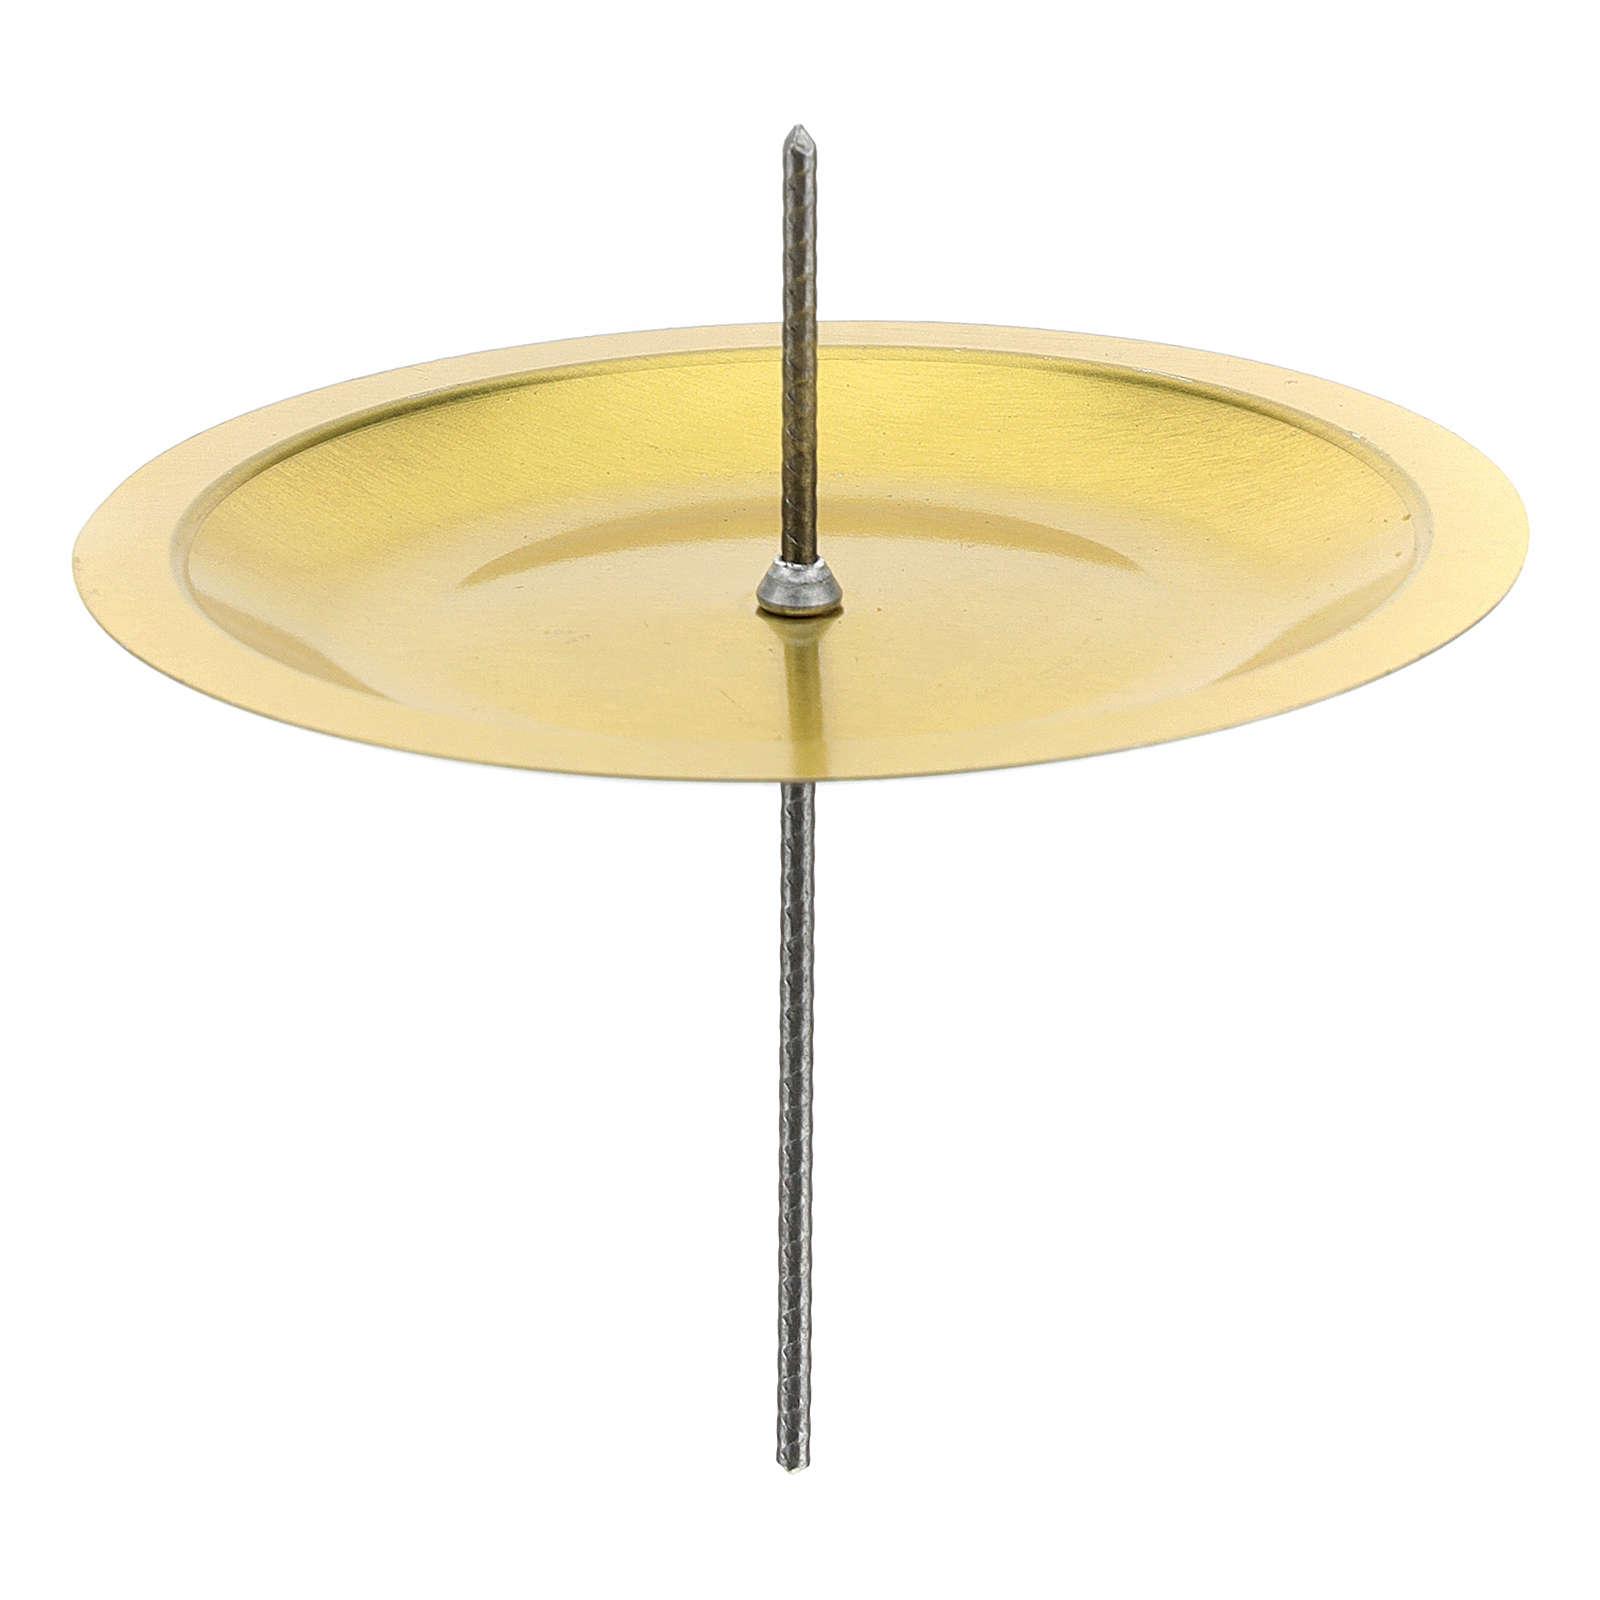 Adventskranzkerzenstecker 4St. Messing 7cm 3